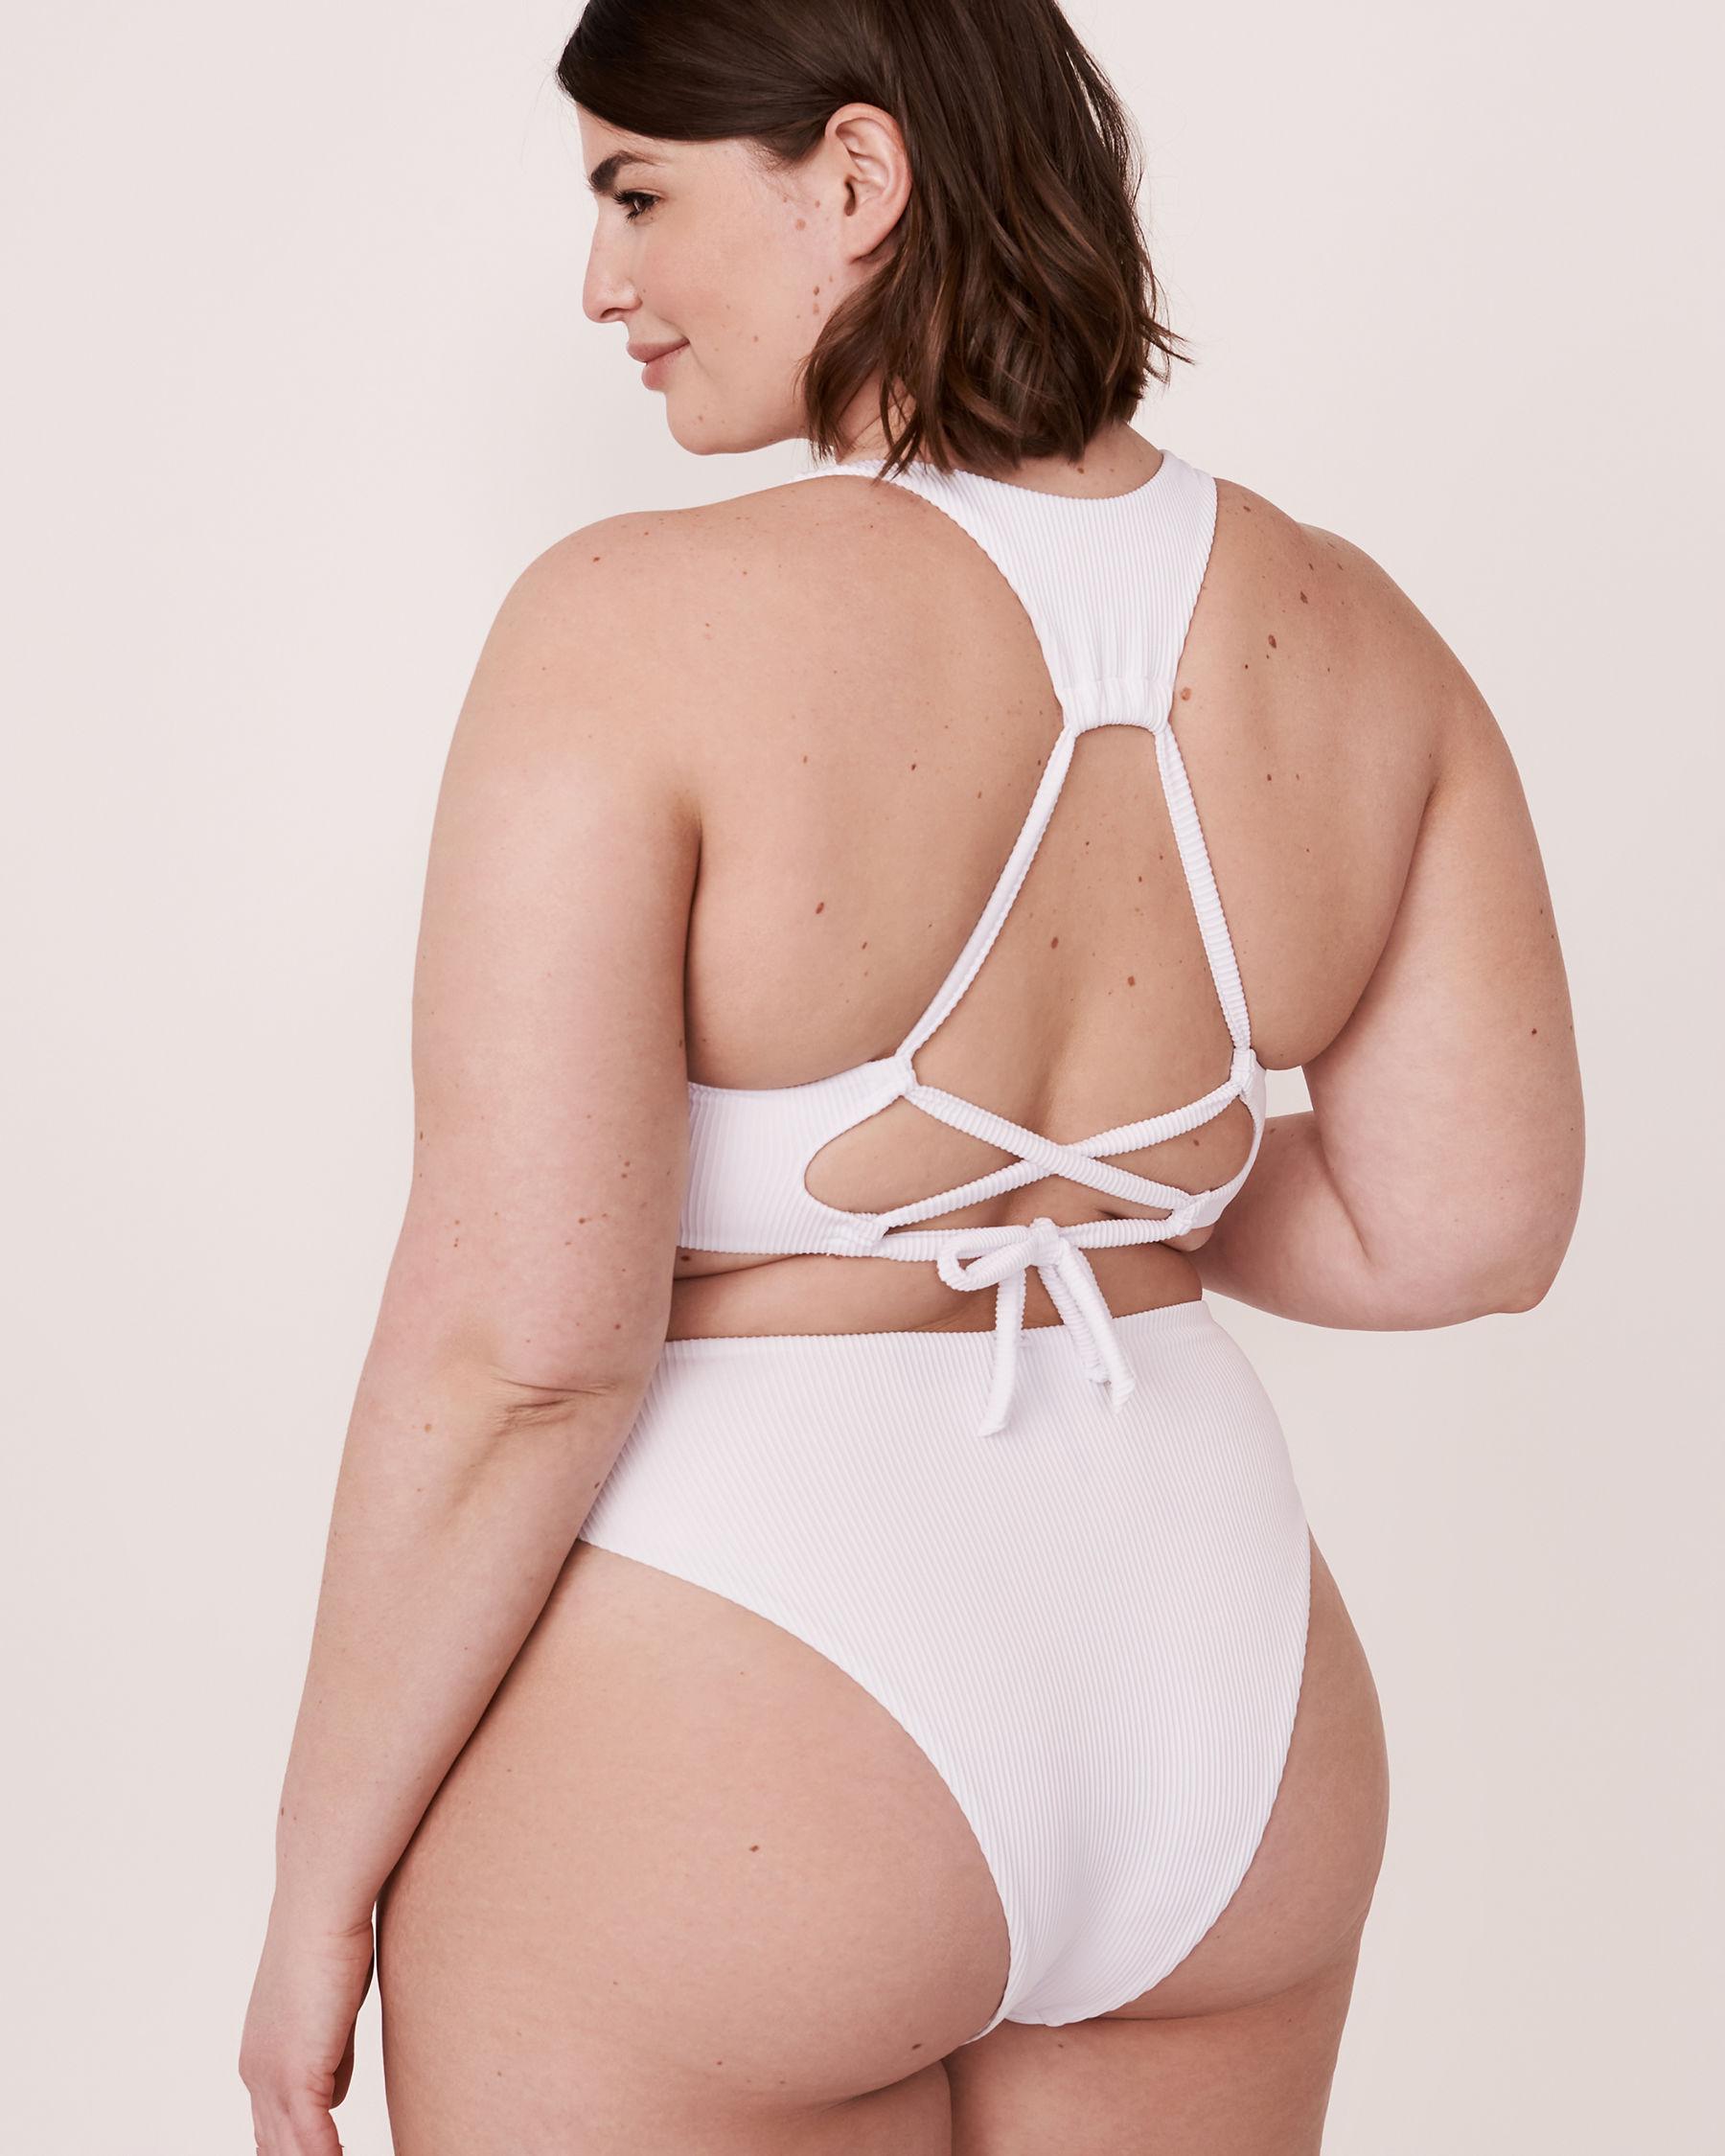 LA VIE EN ROSE AQUA Haut de bikini bralette en fibres recyclées WHITE RIB Blanc 70100095 - Voir2